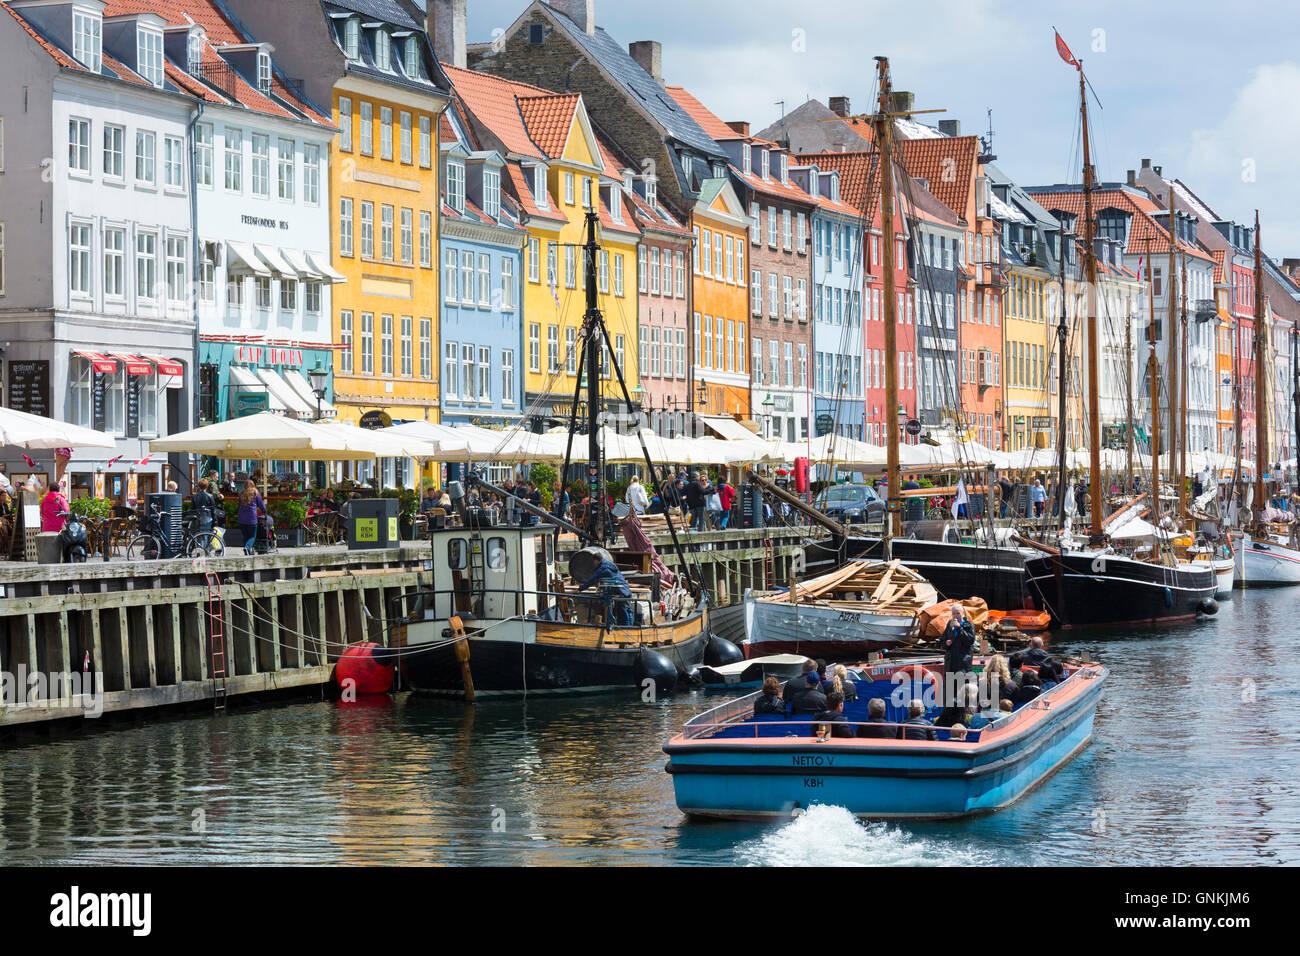 Segelboote am berühmten Nyhavn, 17. Jahrhundert Kanal und Unterhaltung Hafenviertel in Kopenhagen, Dänemark Stockbild